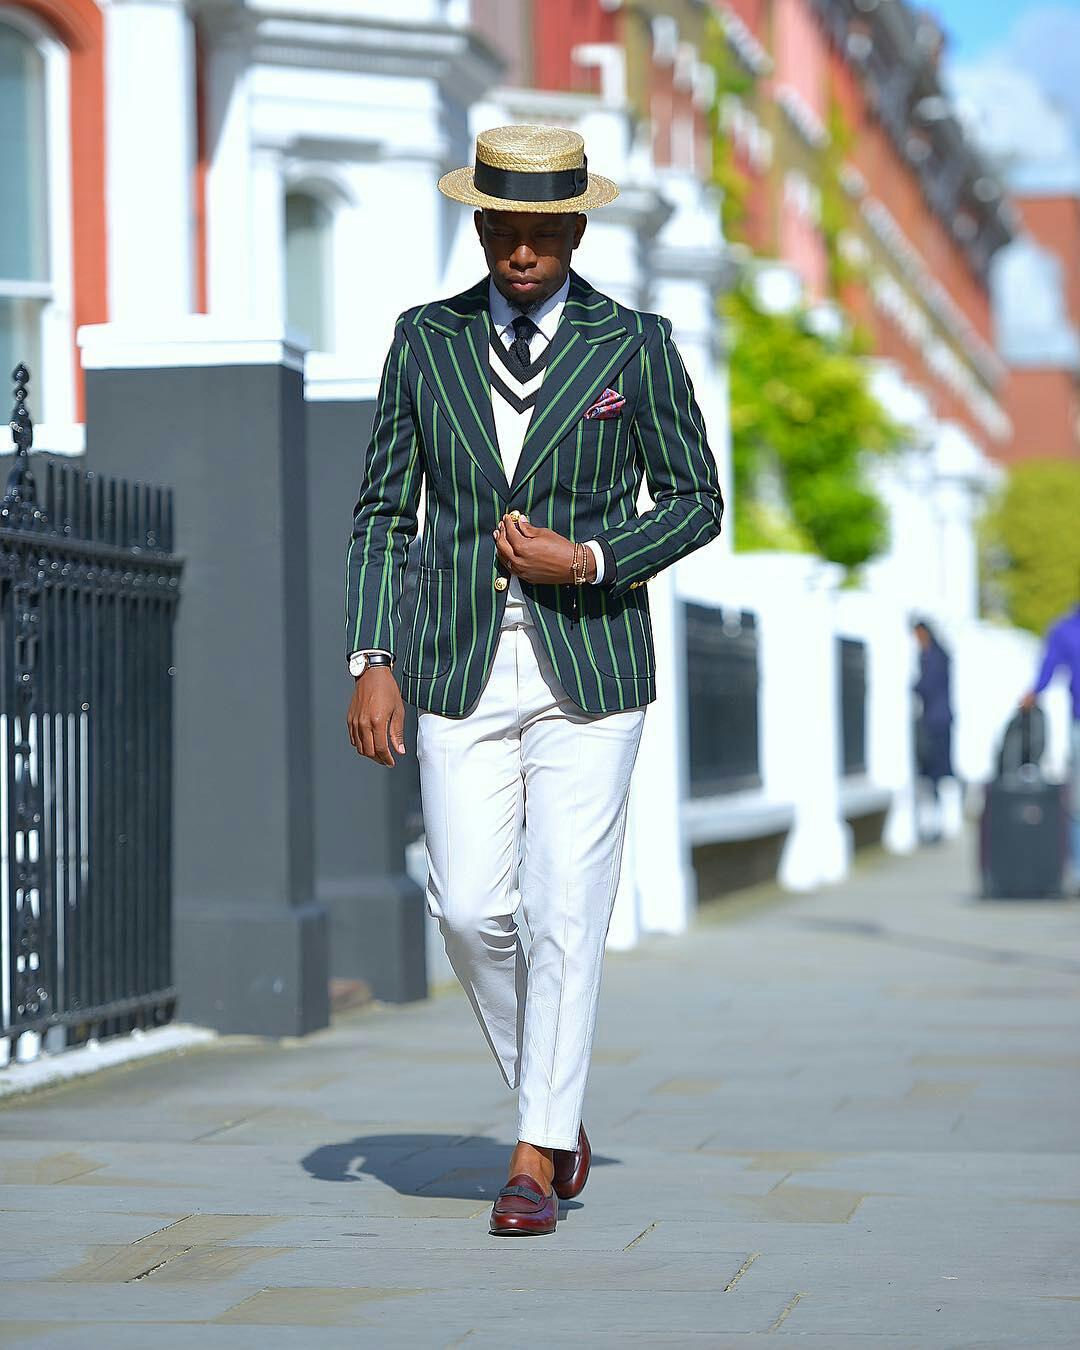 menswear-creative-director-gabriel-akinoshos-style-is-perfectly-debonair-and-dapper